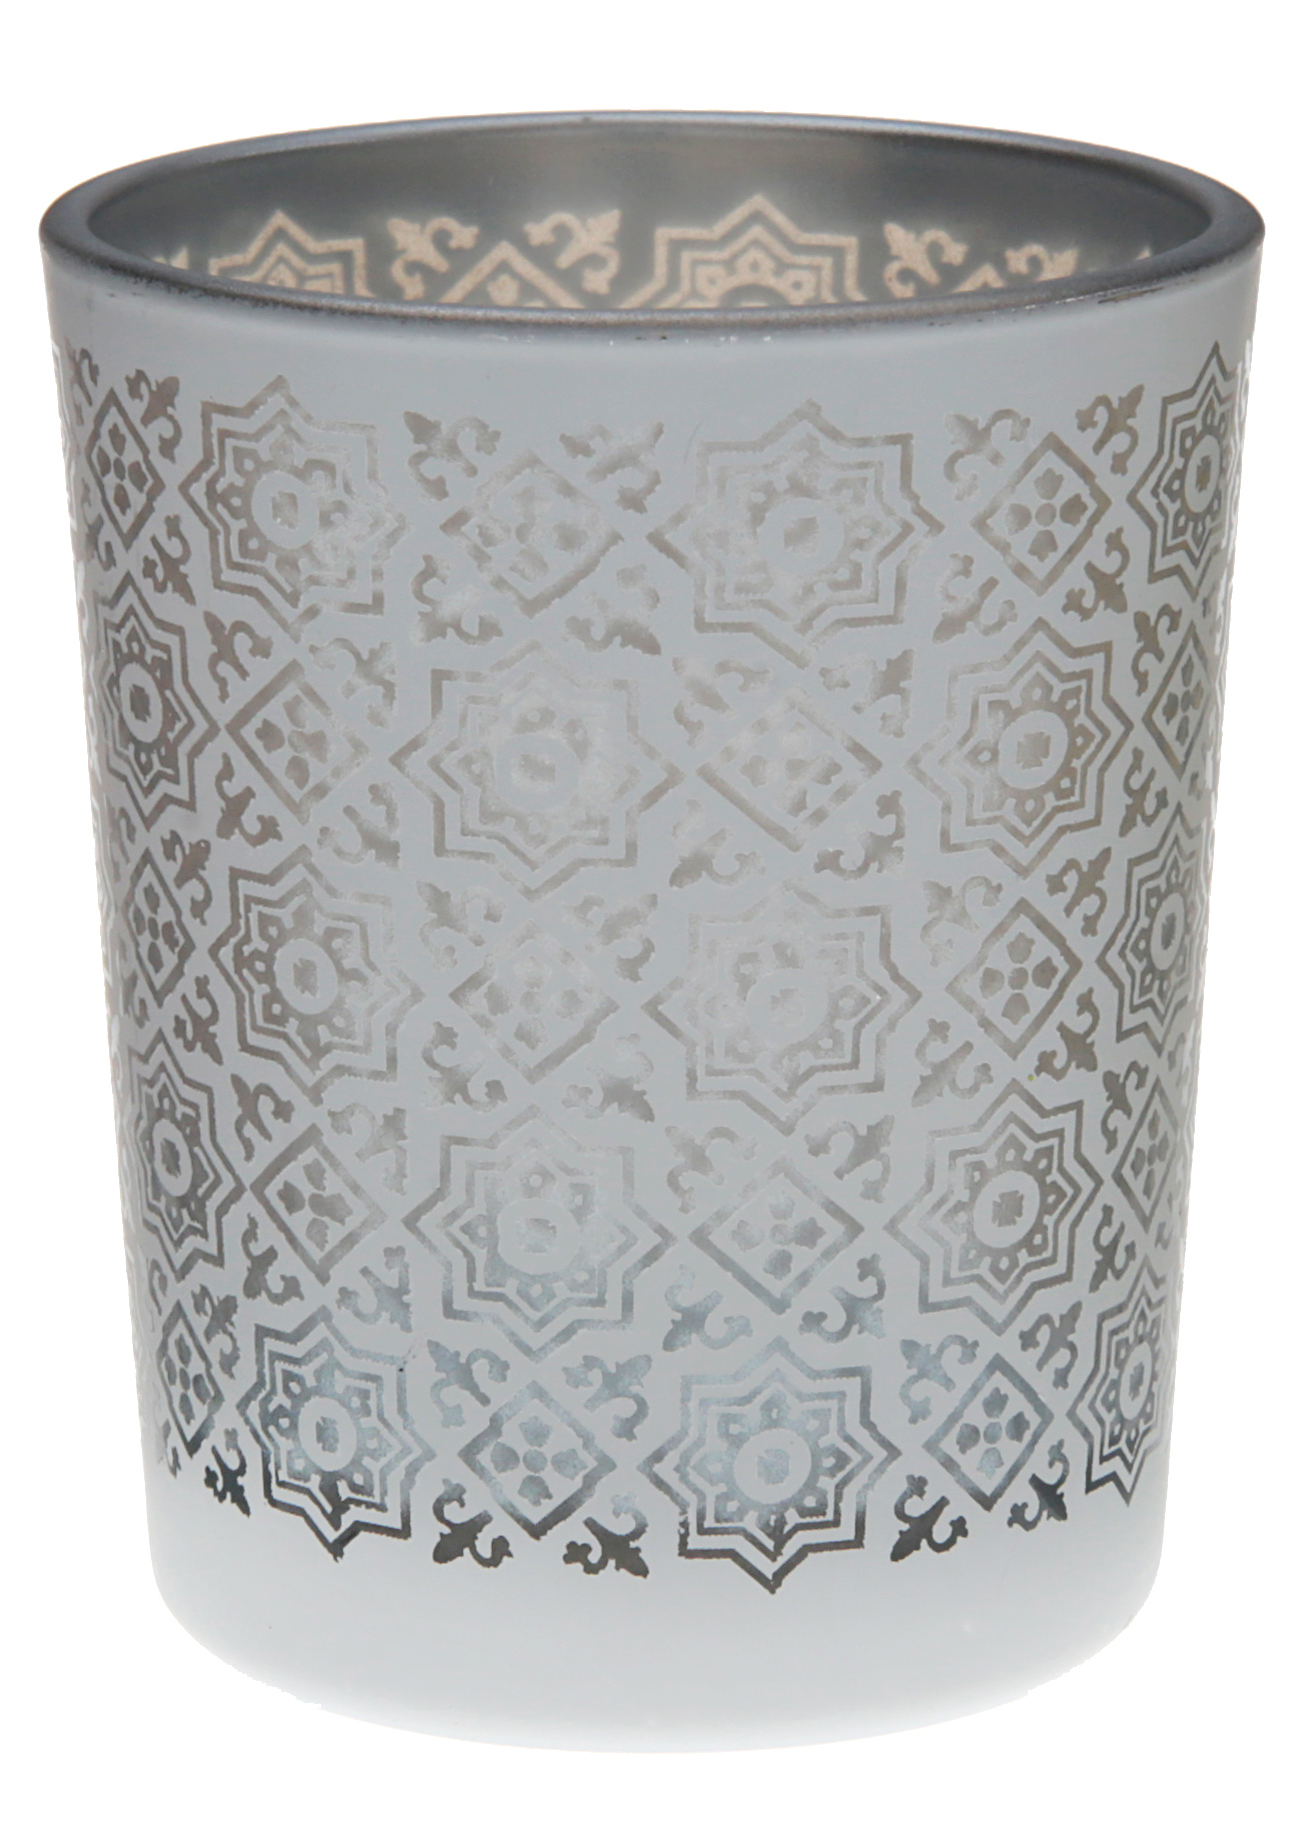 Portacandele in vetro con motivi color argento su for Portacandele in vetro